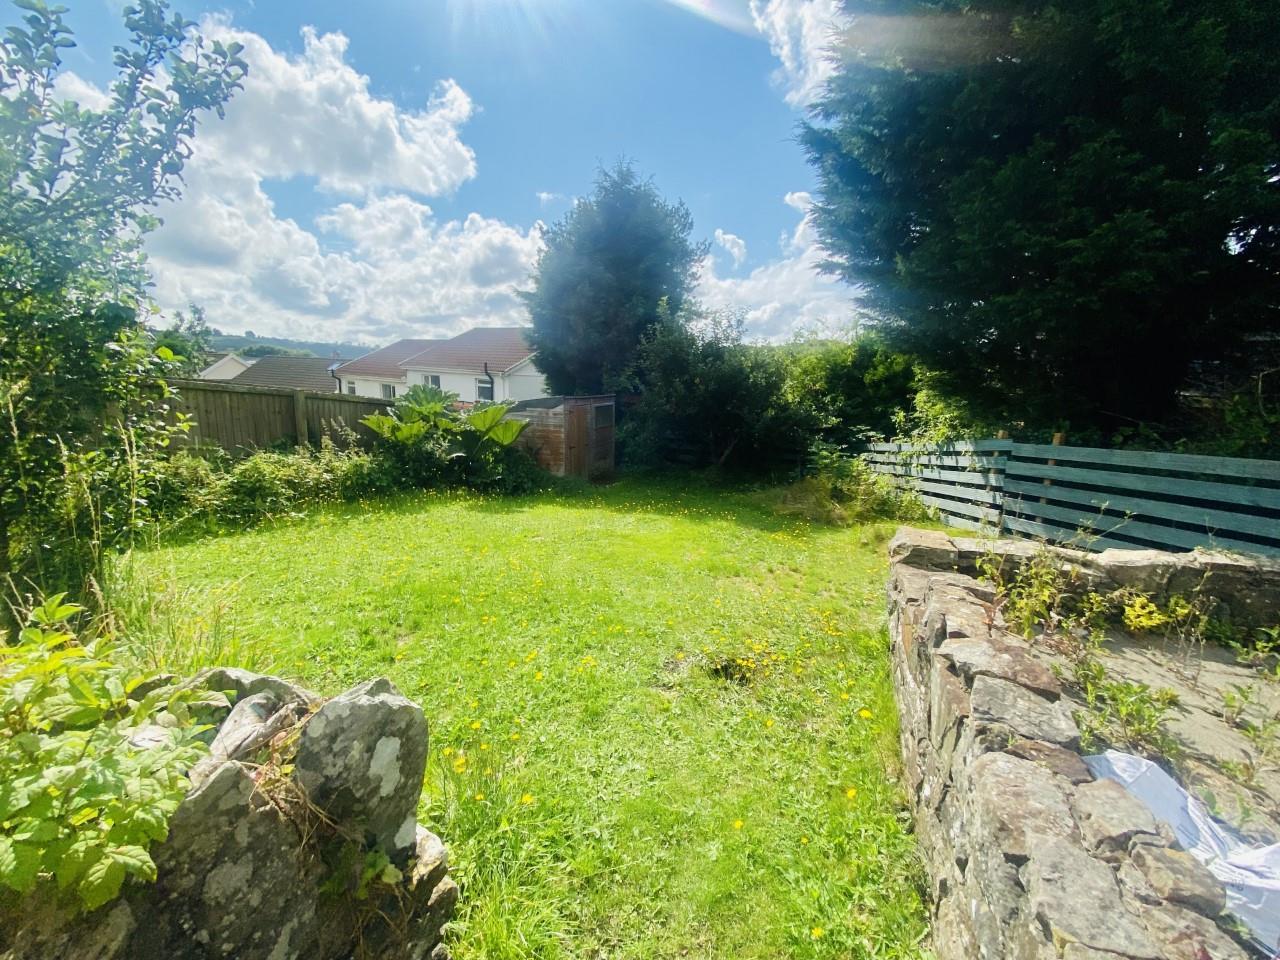 Howells Road, Dunvant, Swansea, SA2 7SX